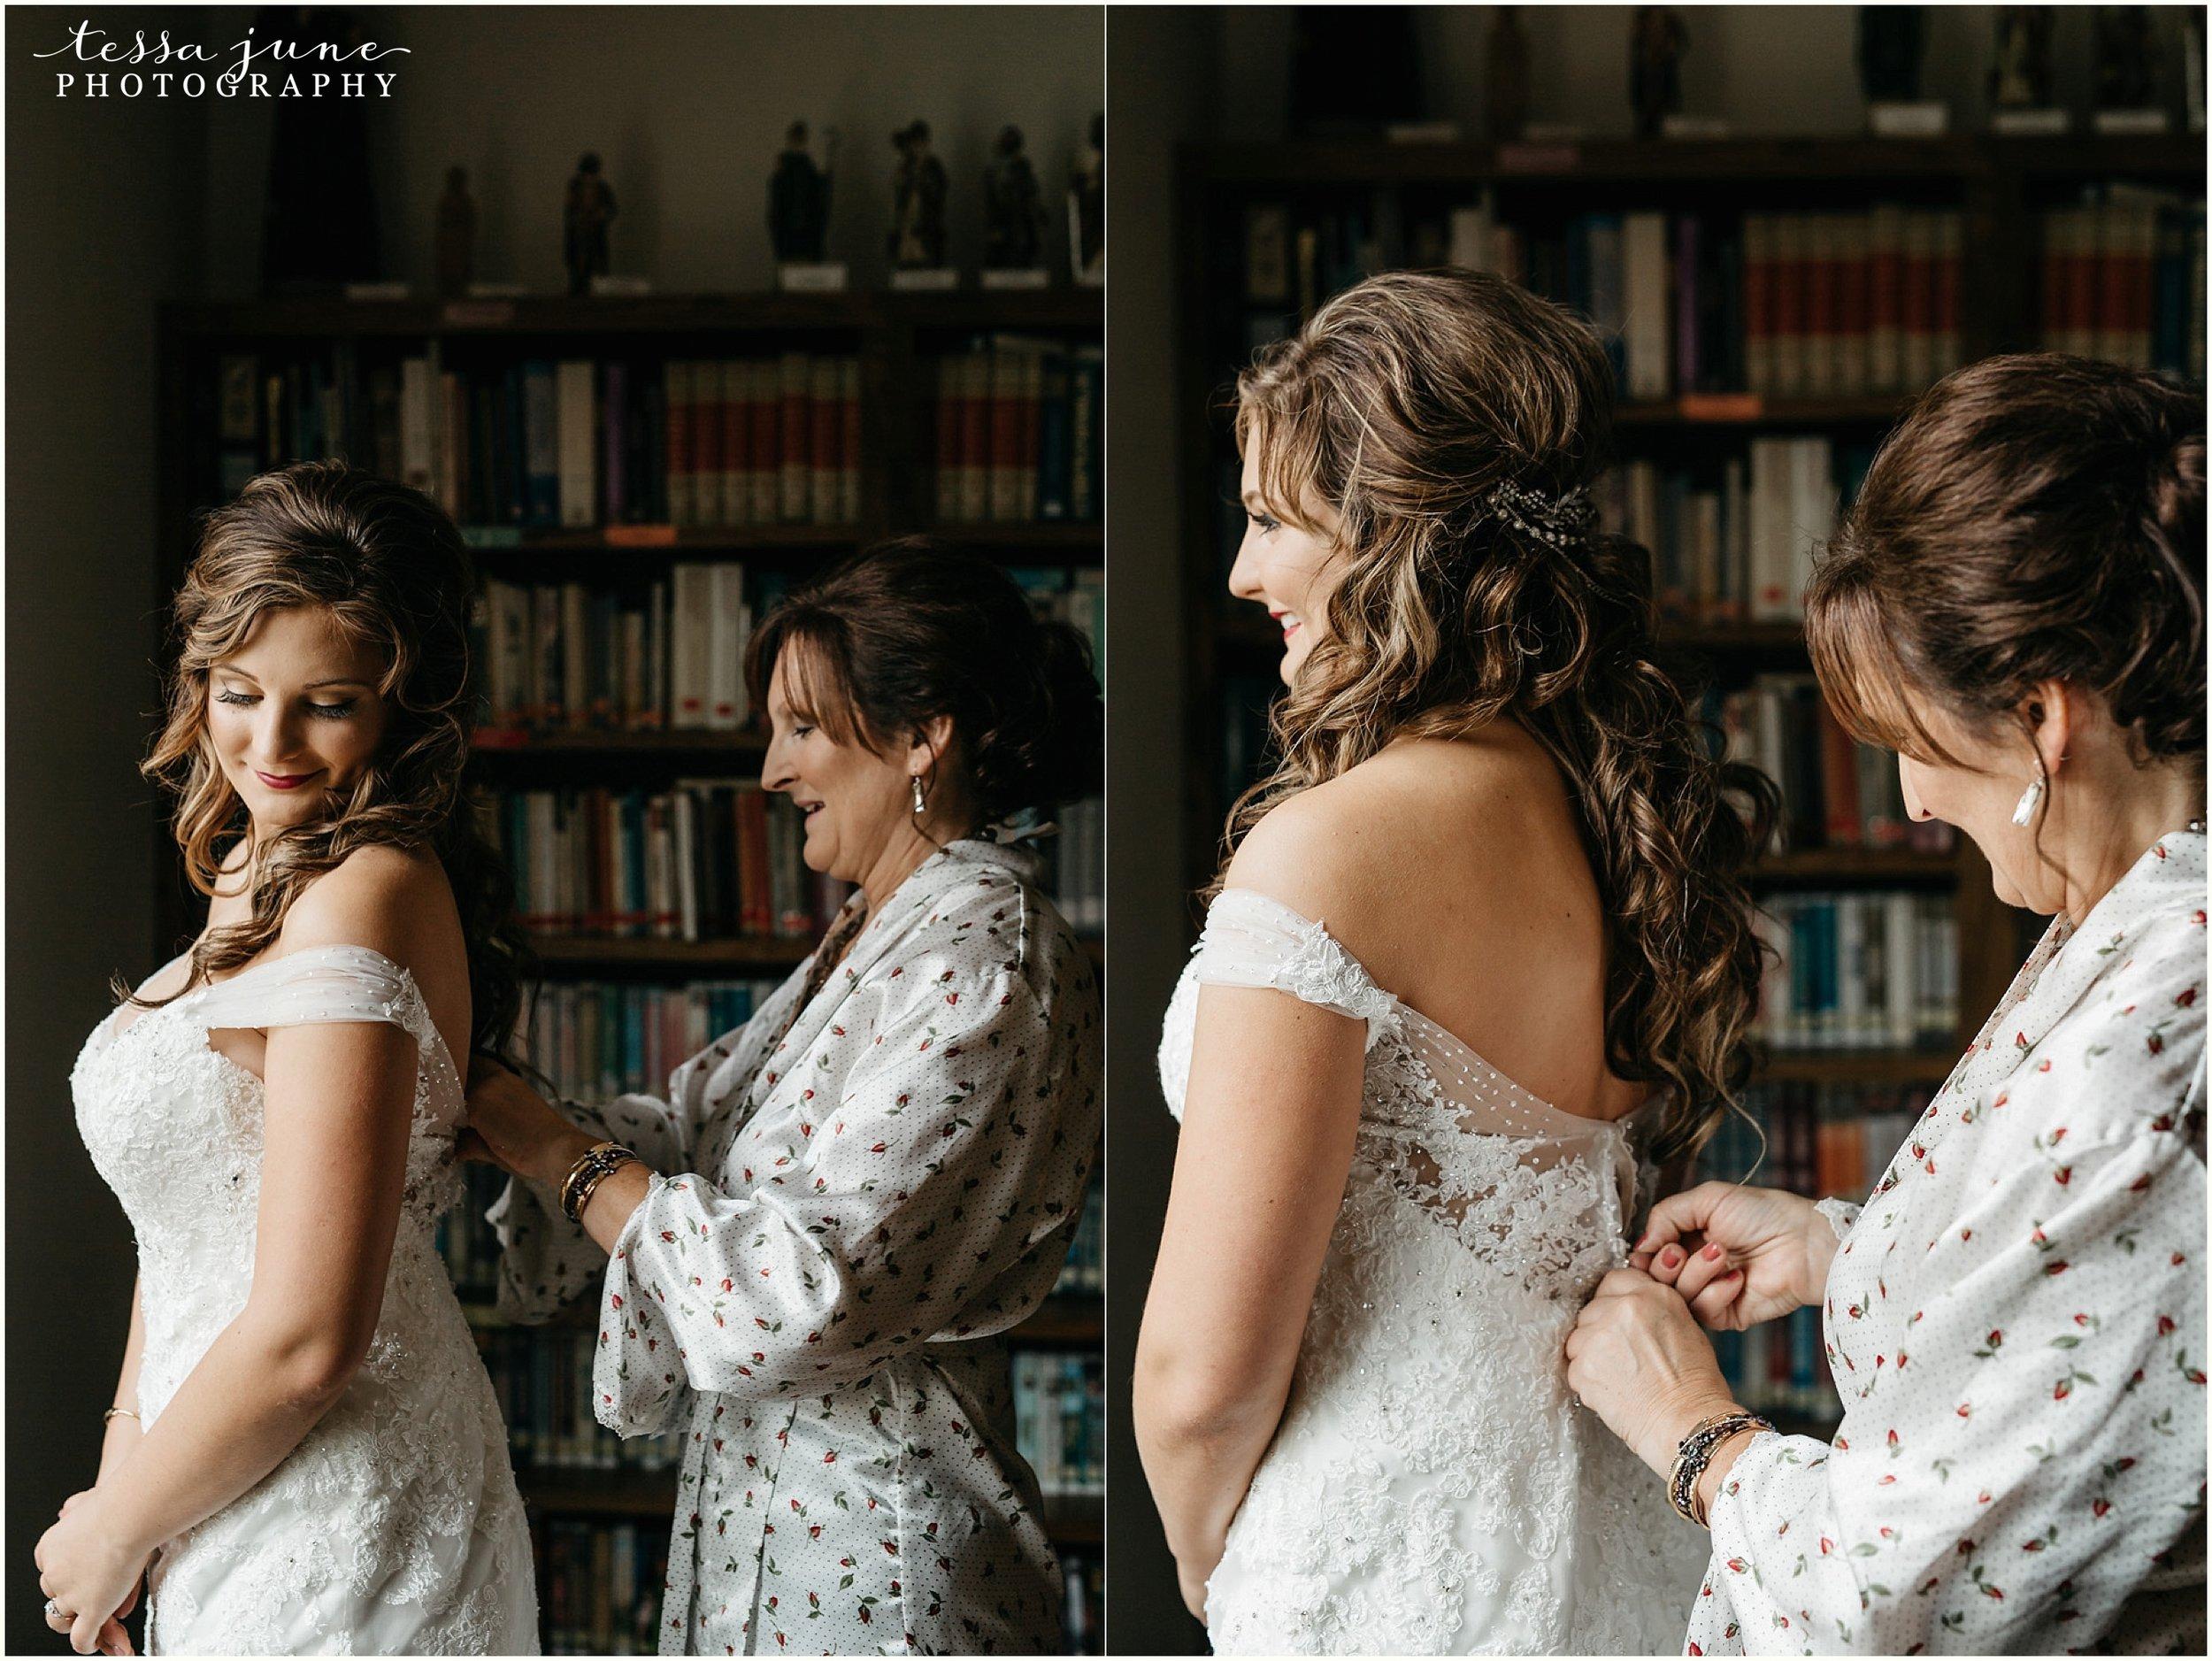 bohemian-minnesota-wedding-mismatched-bridesmaid-dresses-waterfall-st-cloud-tessa-june-photography-25.jpg